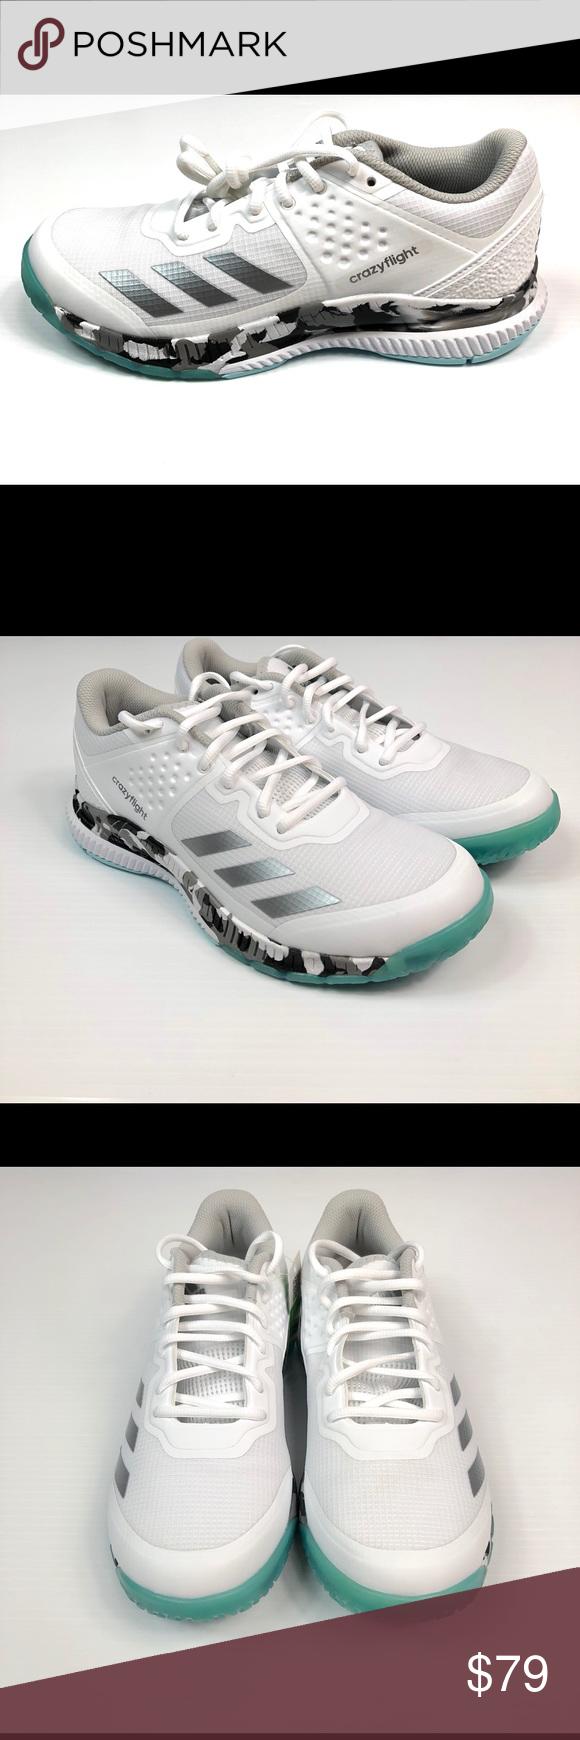 Adidas Crazyflight Volleyball Shoes Size 8 Womens Adidas Crazyflight Bounce Women S Volleyball Shoes White Size 8 By Volleyball Shoes Adidas Women Size 8 Women